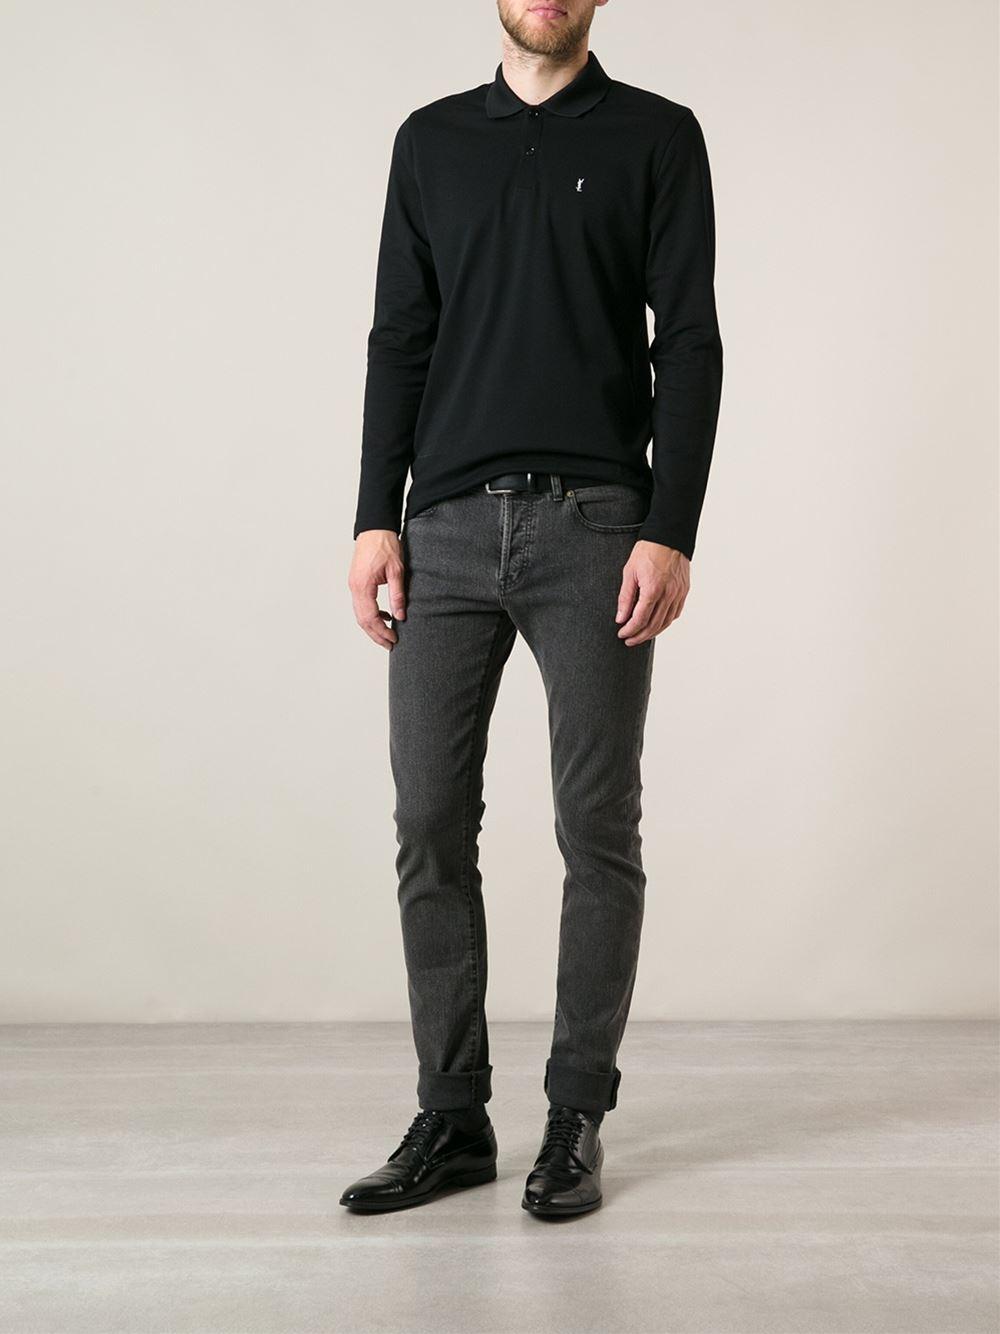 0b19aca8 ... good lyst saint laurent long sleeve polo shirt in black for men 2f975  27acd